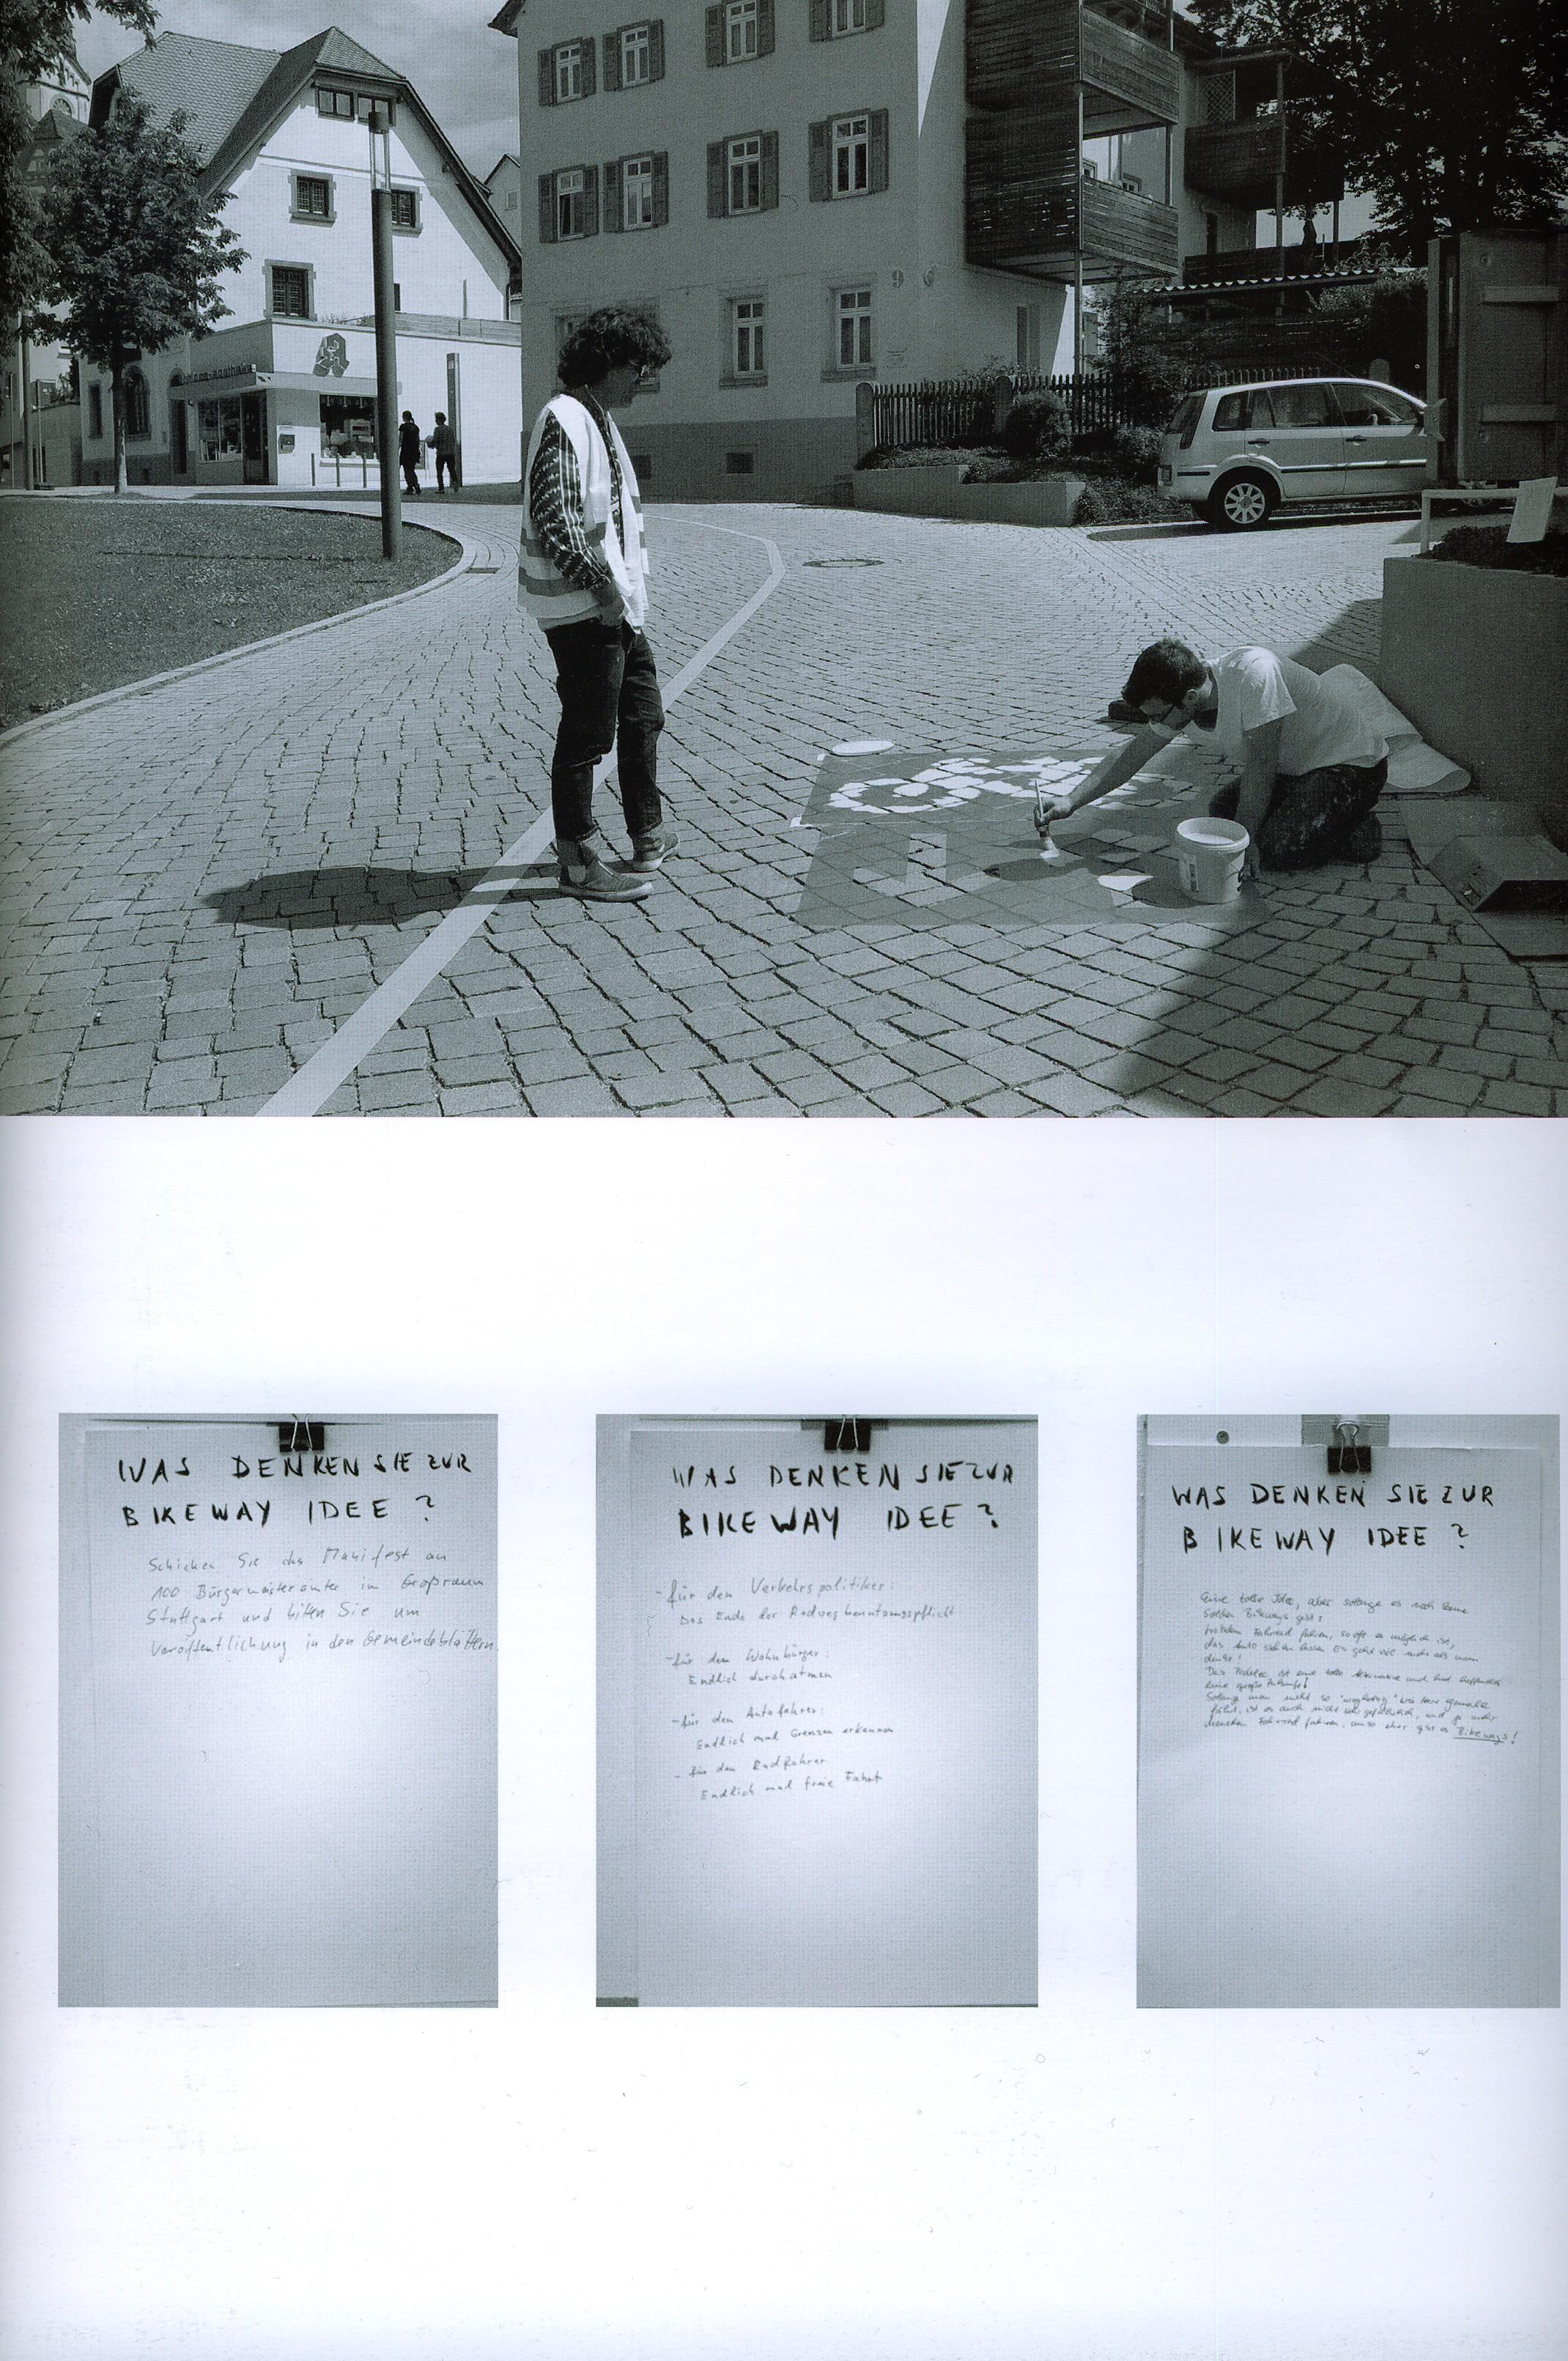 derive-RG+Josh Kopie